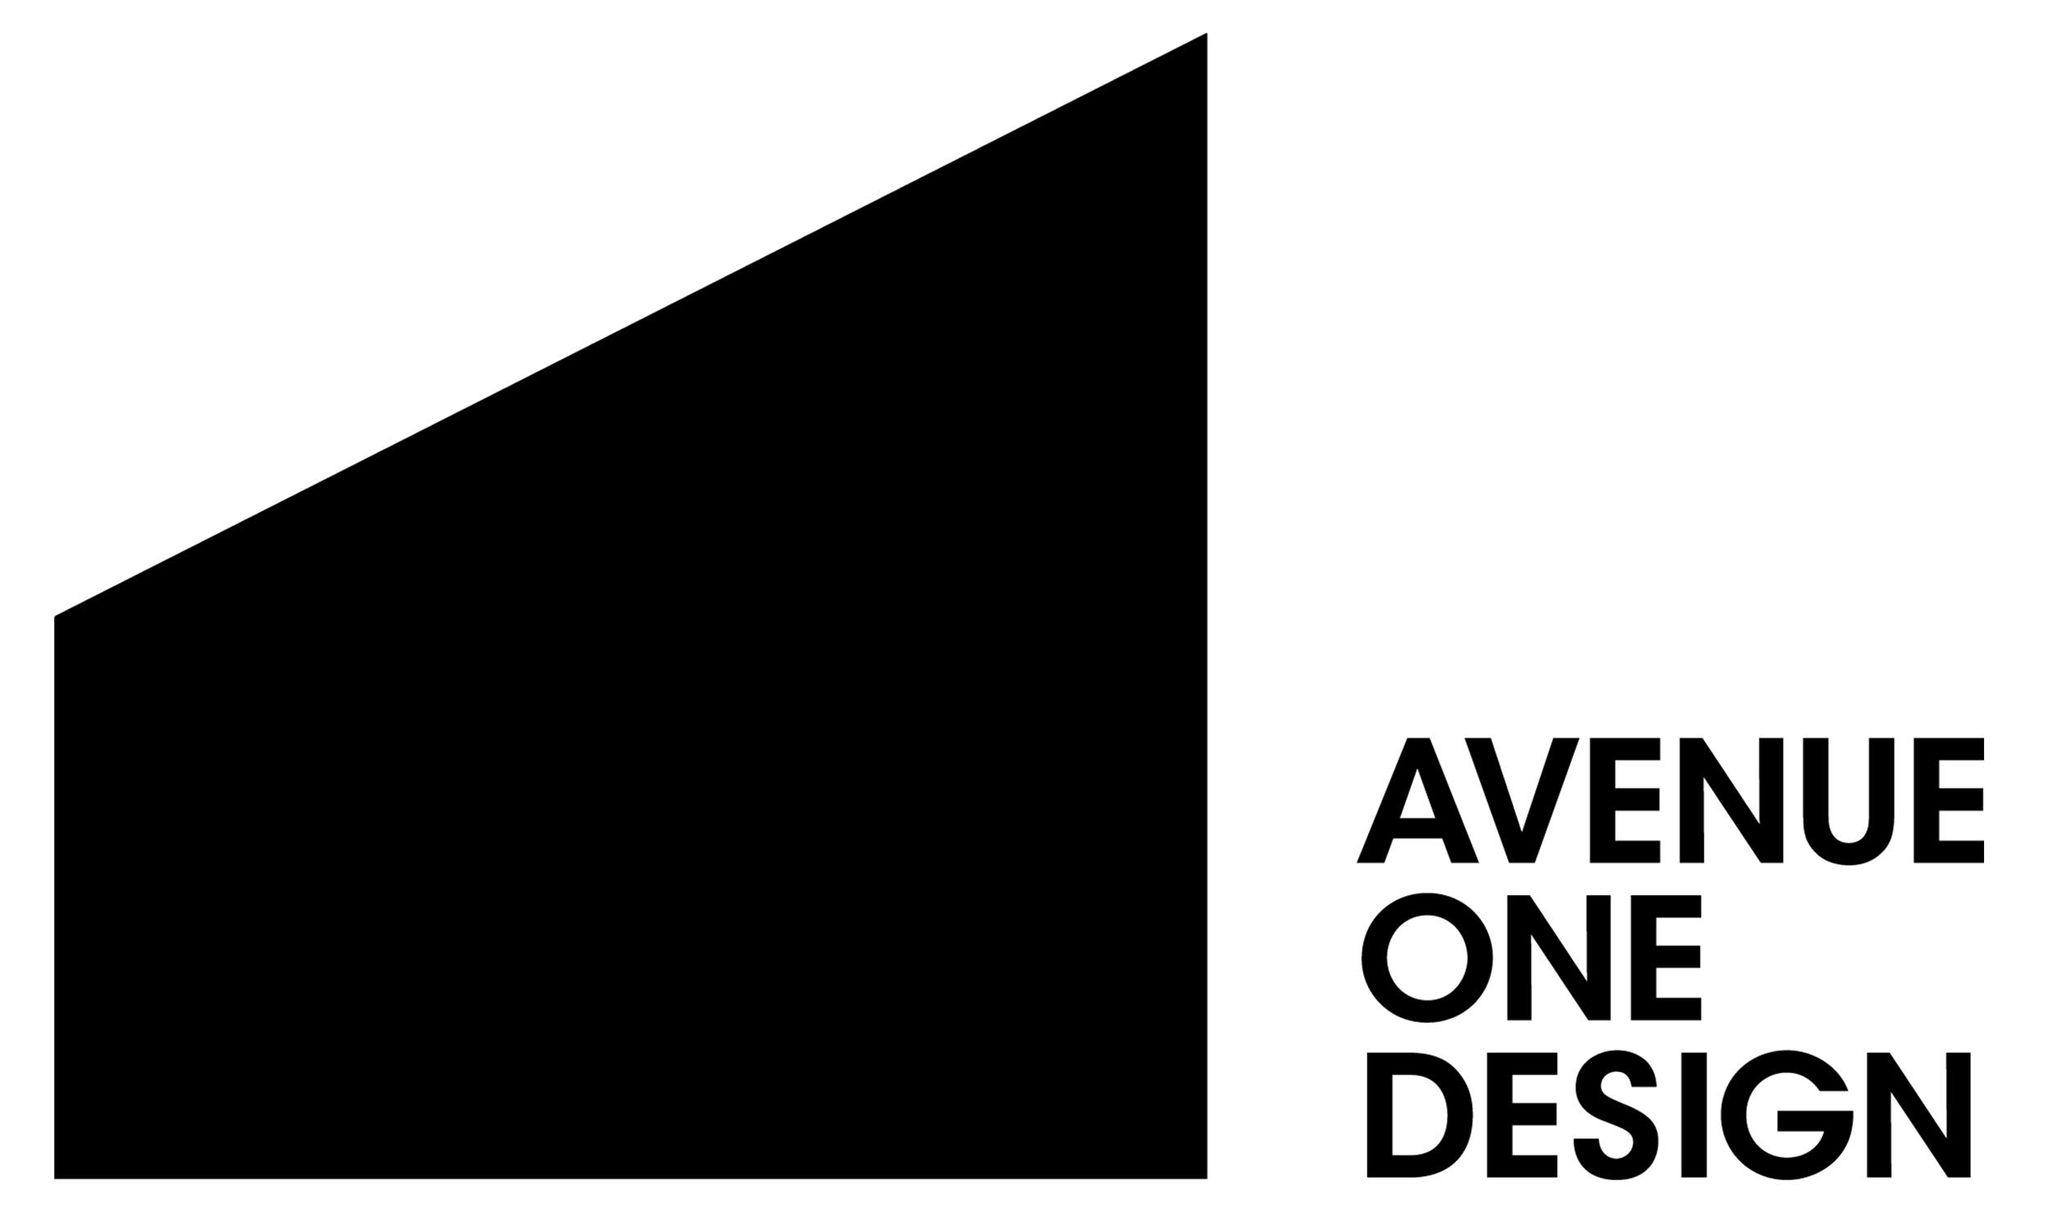 logo avenue one